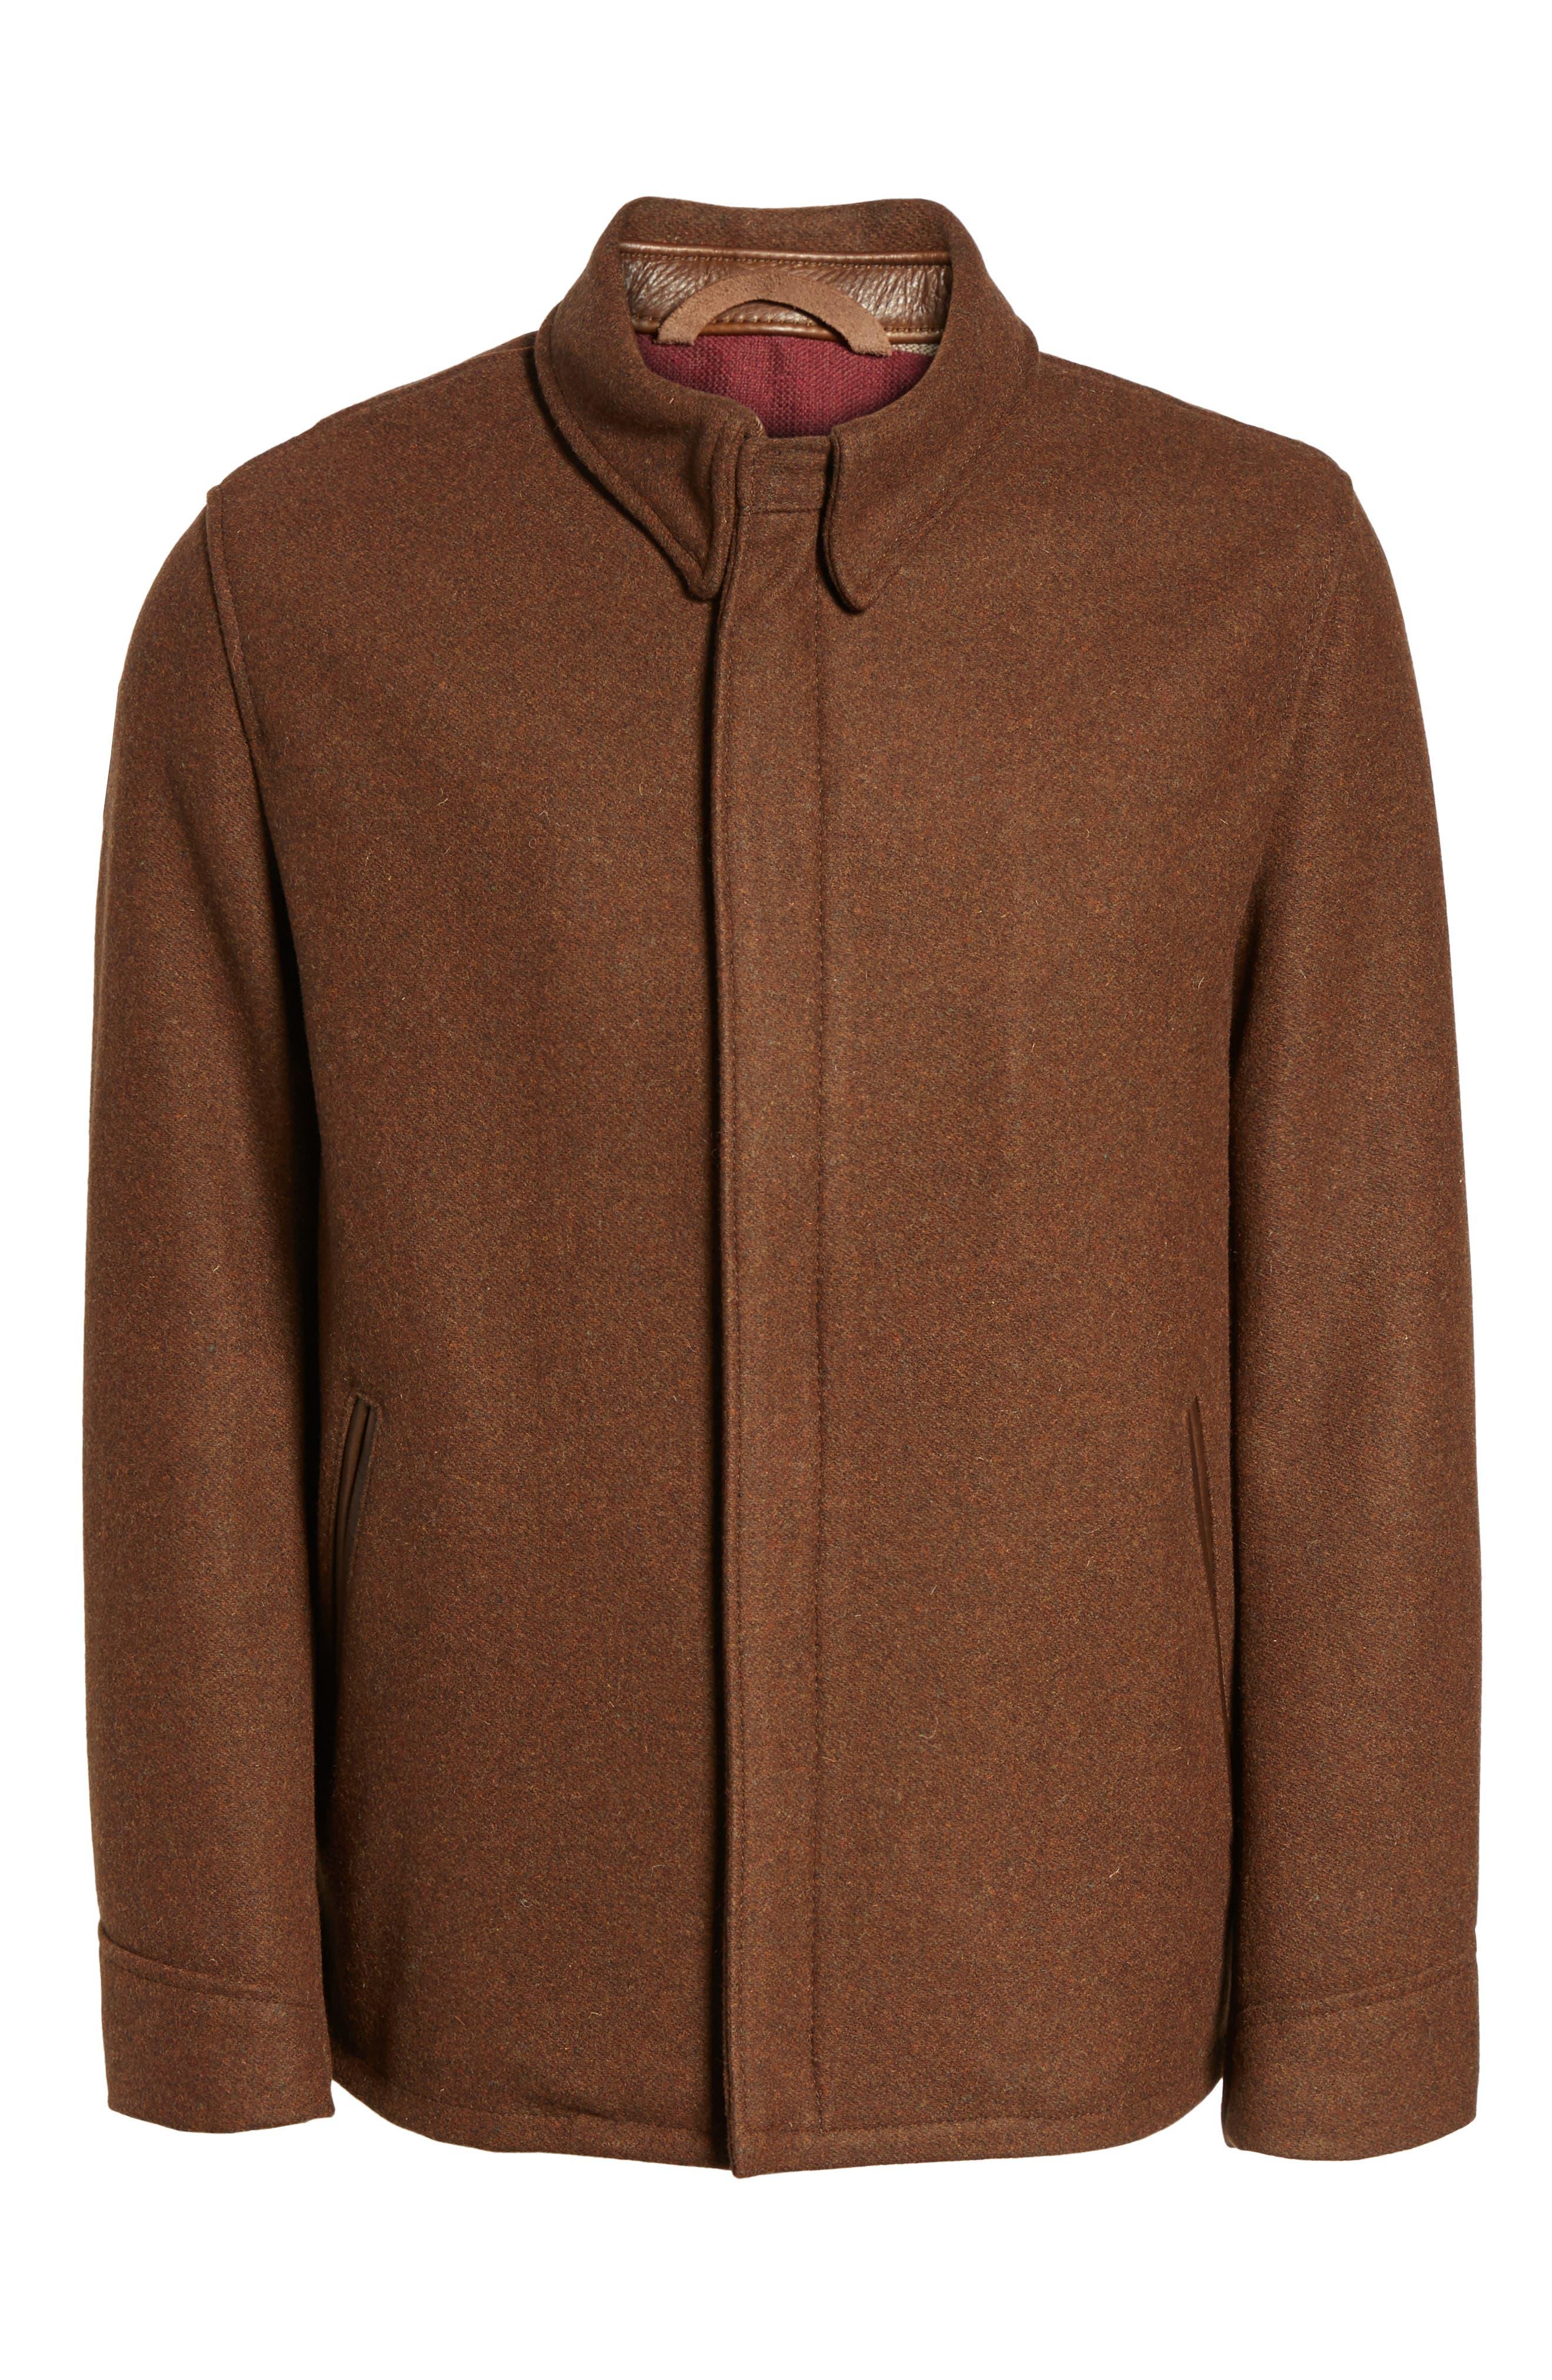 Liberty Wool Blend Zip Front Jacket,                             Alternate thumbnail 5, color,